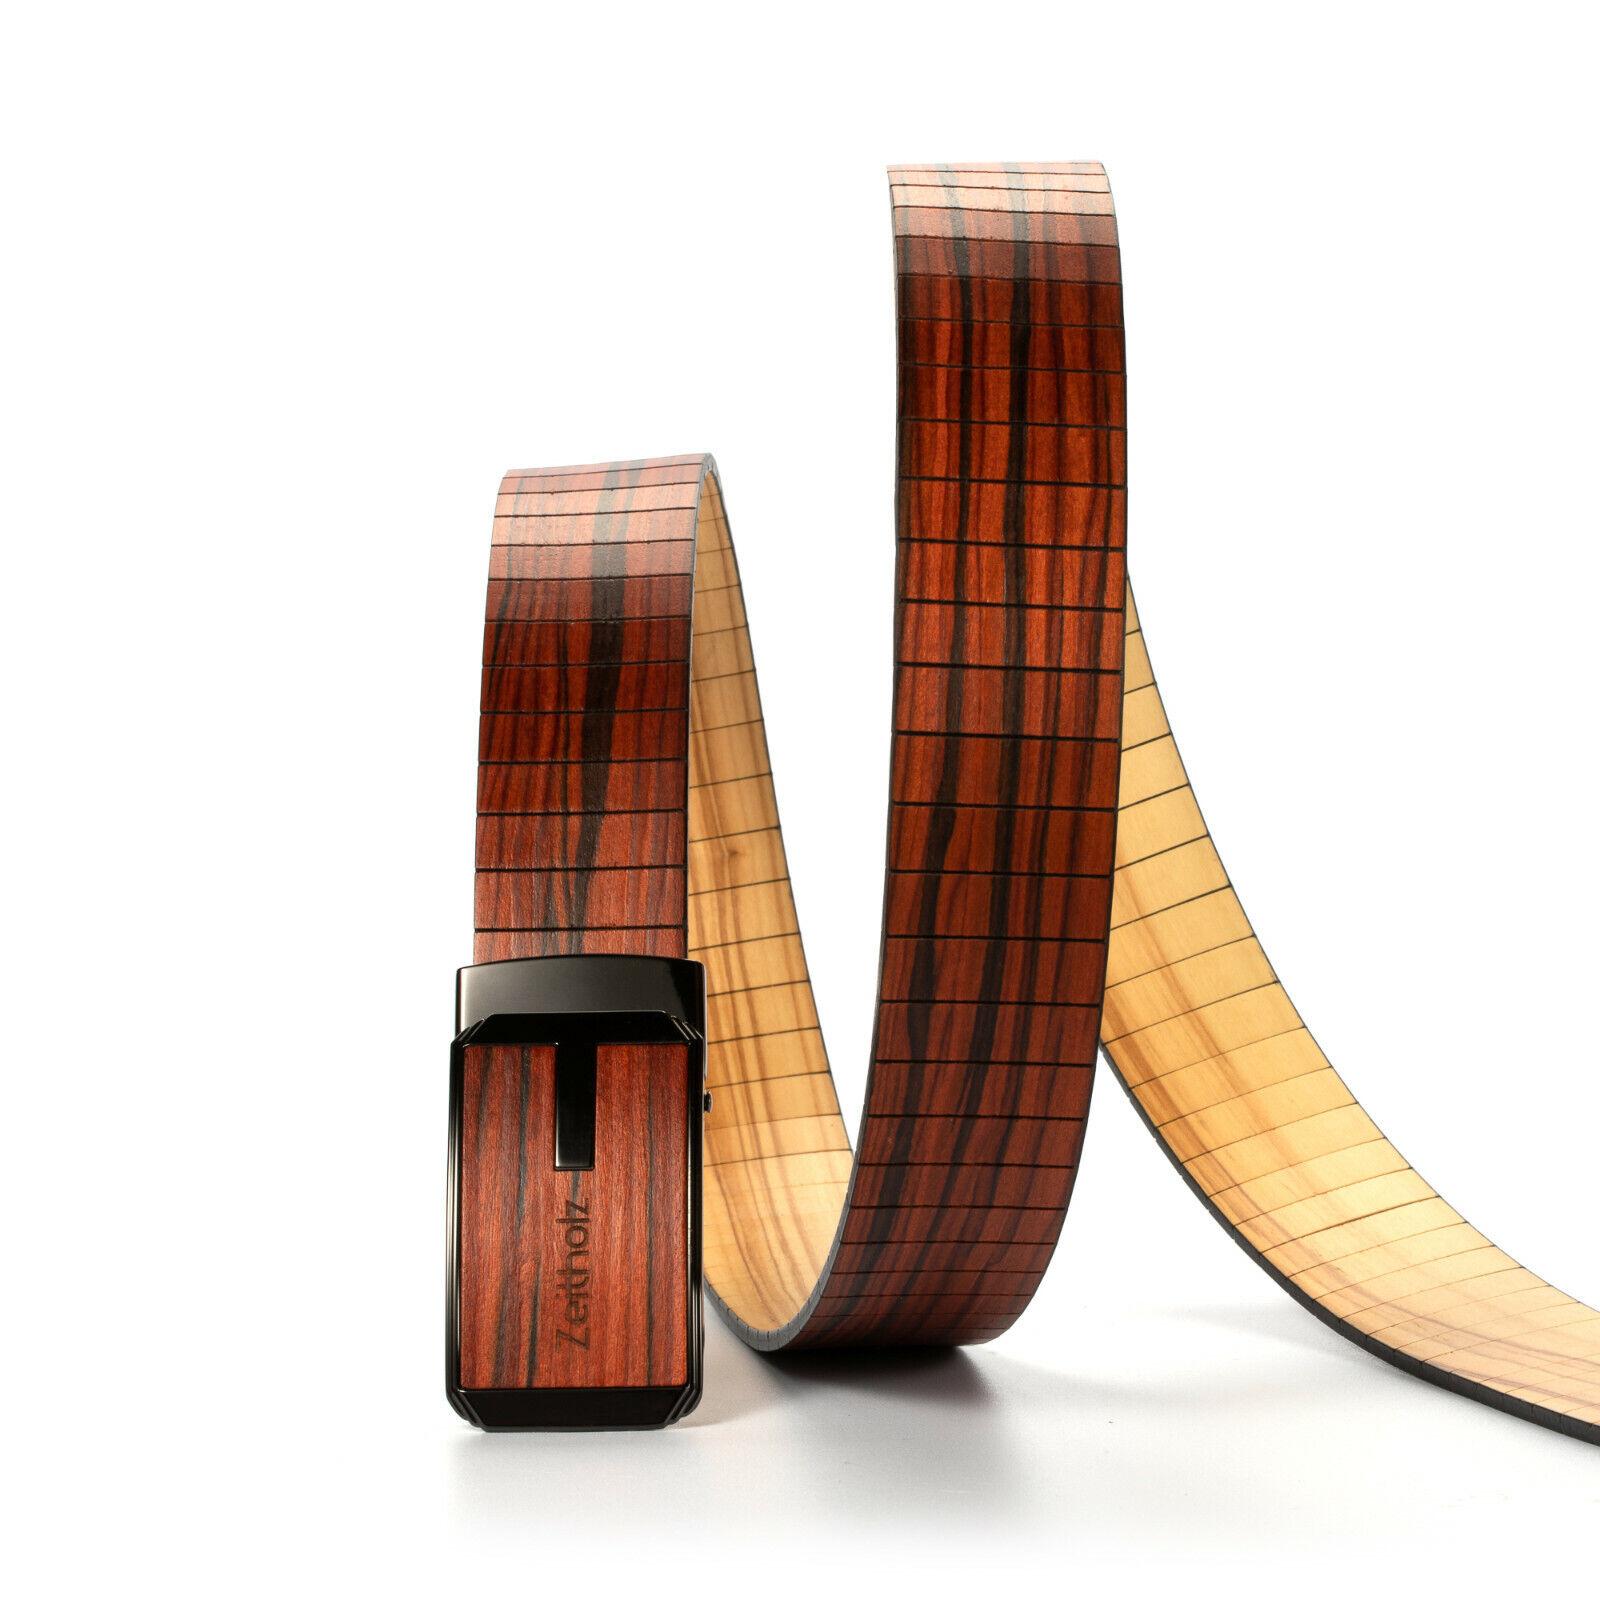 Holzgürtel Gürtel Unisex Olivenholz Braun handmade nickelfrei Neu